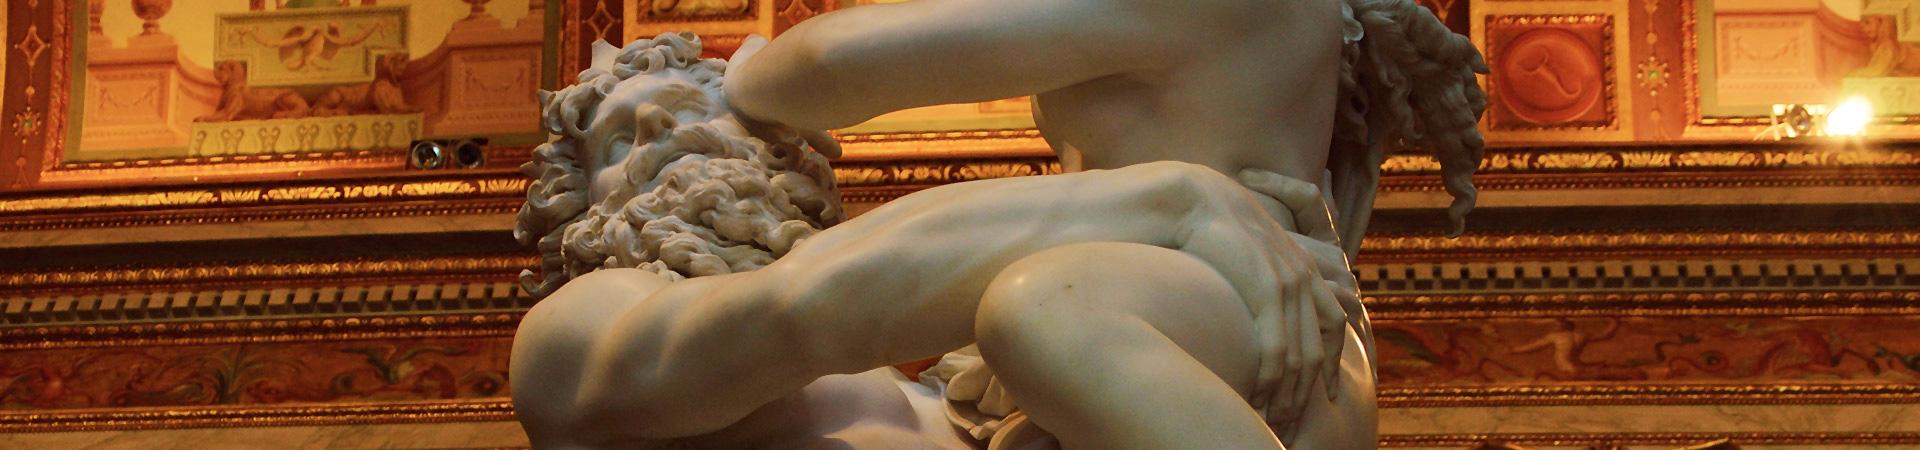 masterpiece of Gian Lorenzo Bernini, Rape of Proserpine, Borghese Gallery, Rome